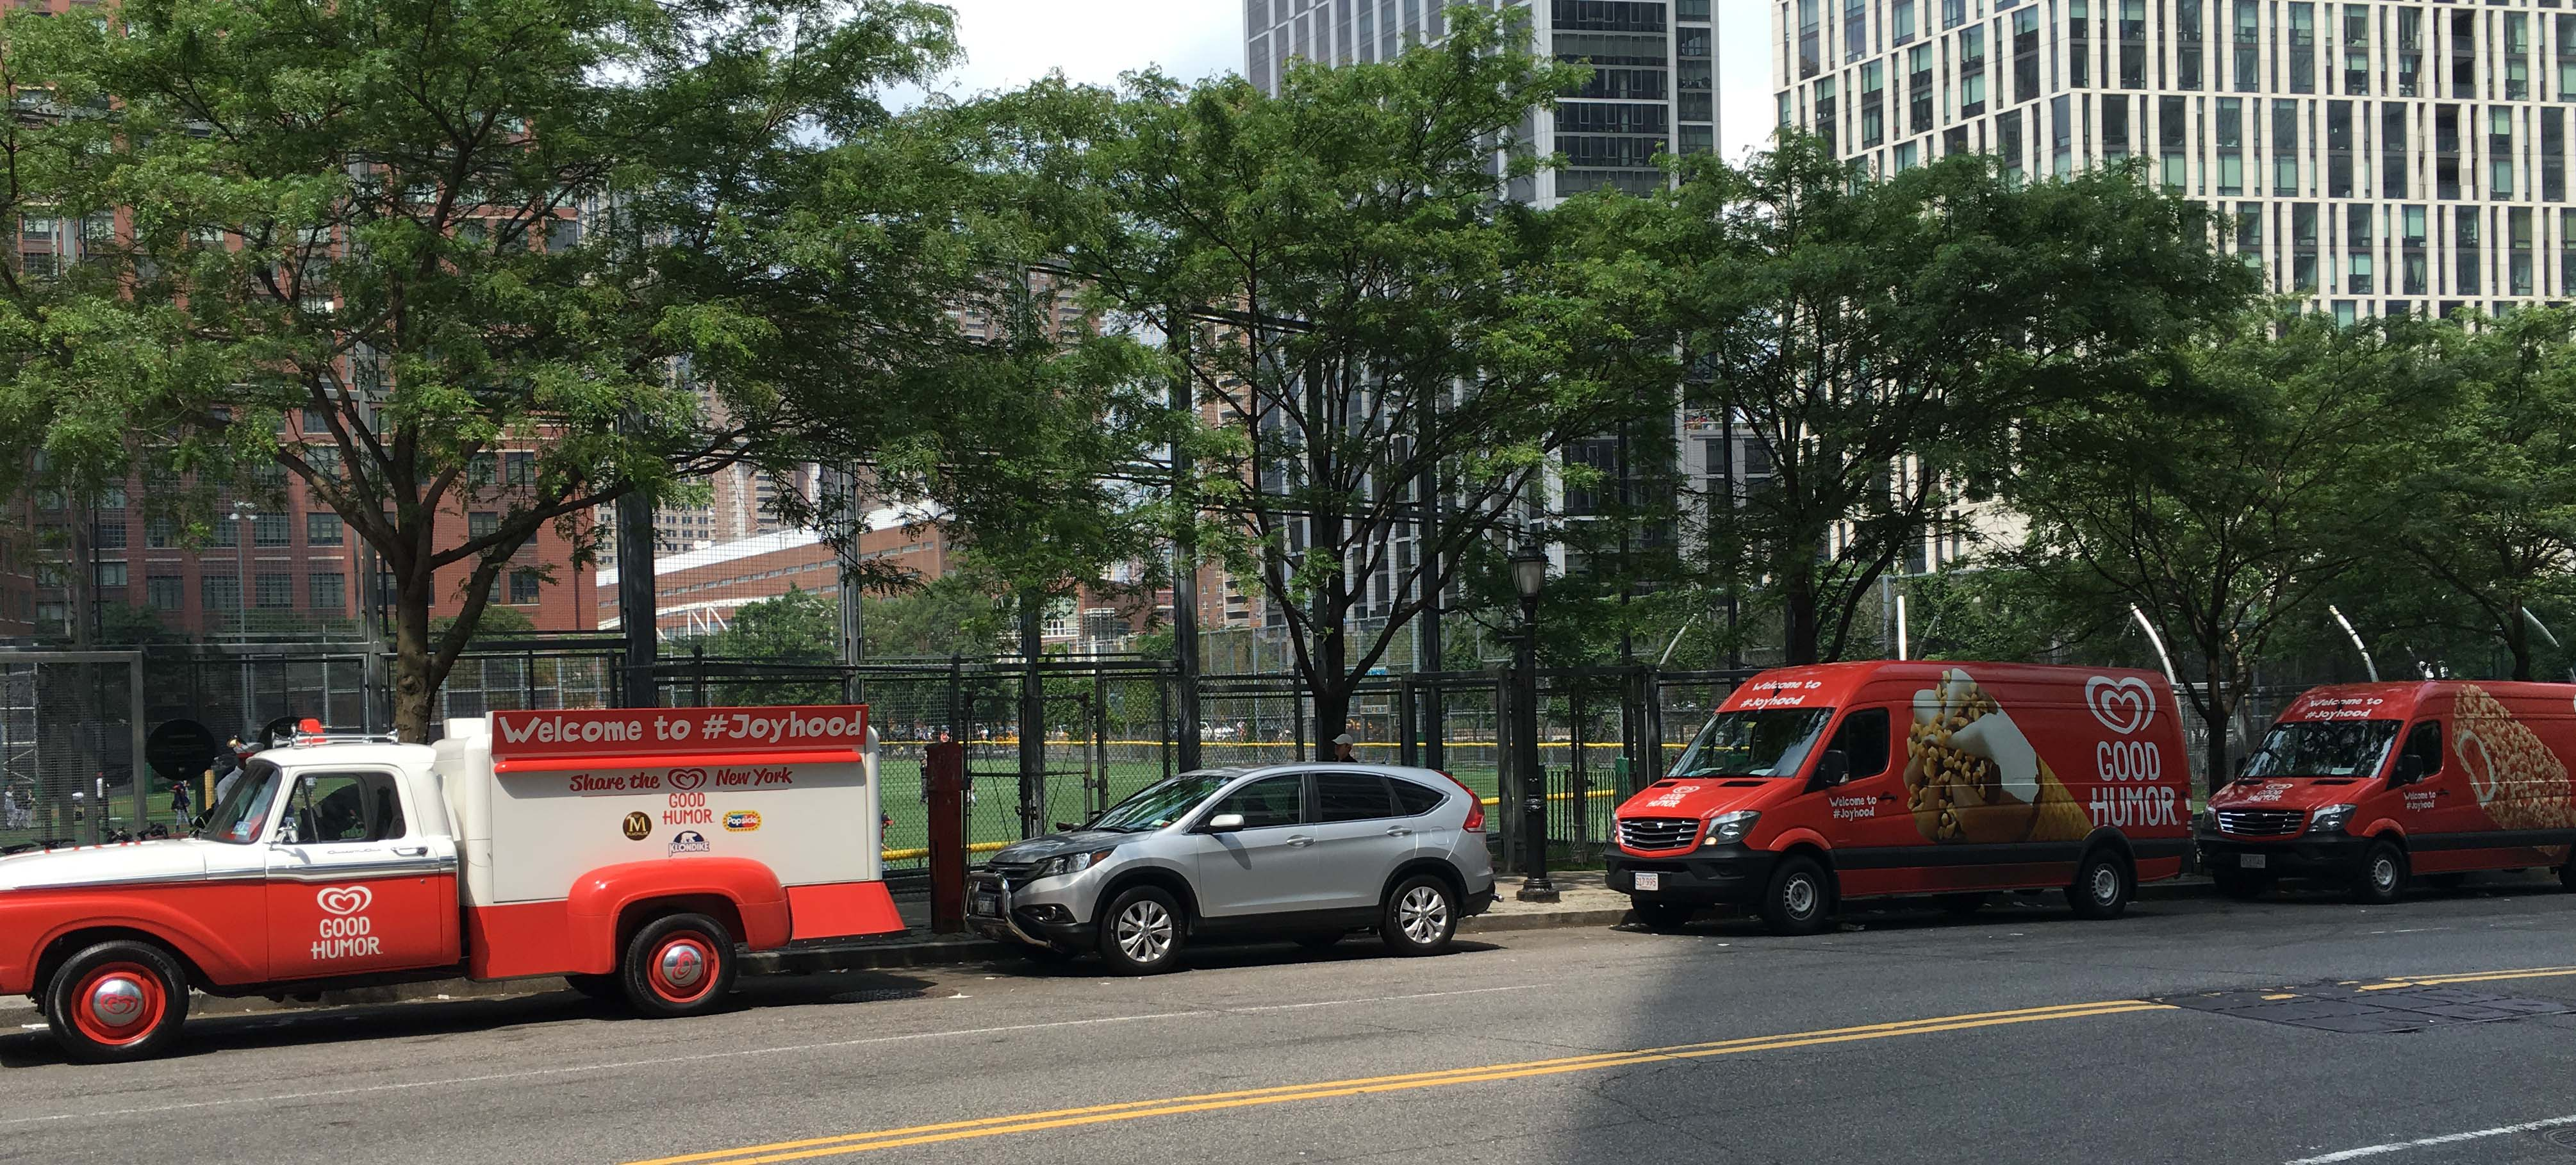 Invasion of the Good Humor ice cream trucks